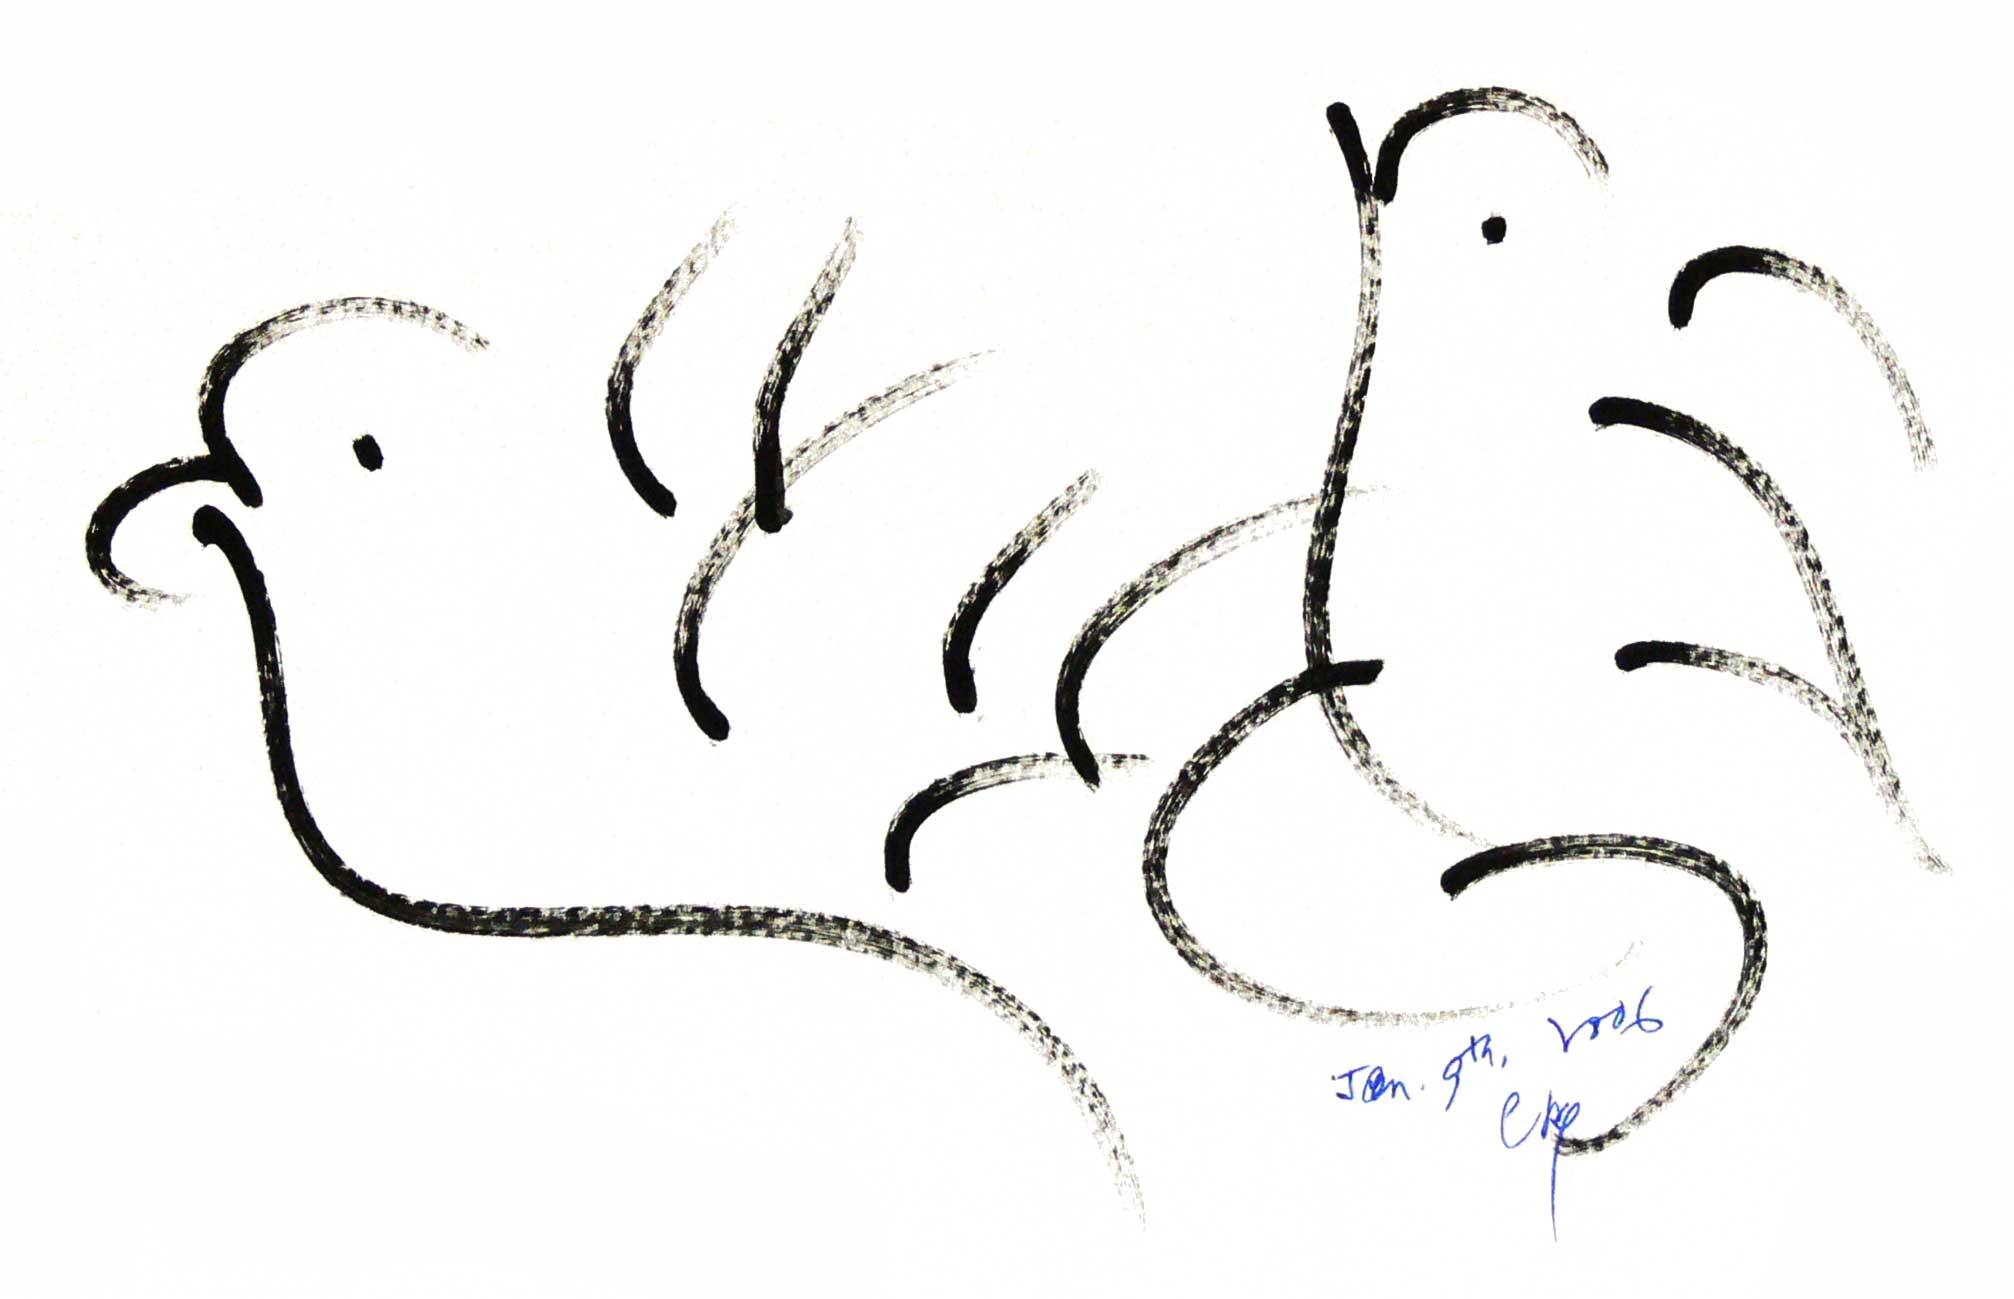 Bird-Drawing-by-Sri-Chinmoy-9-1-2006-4